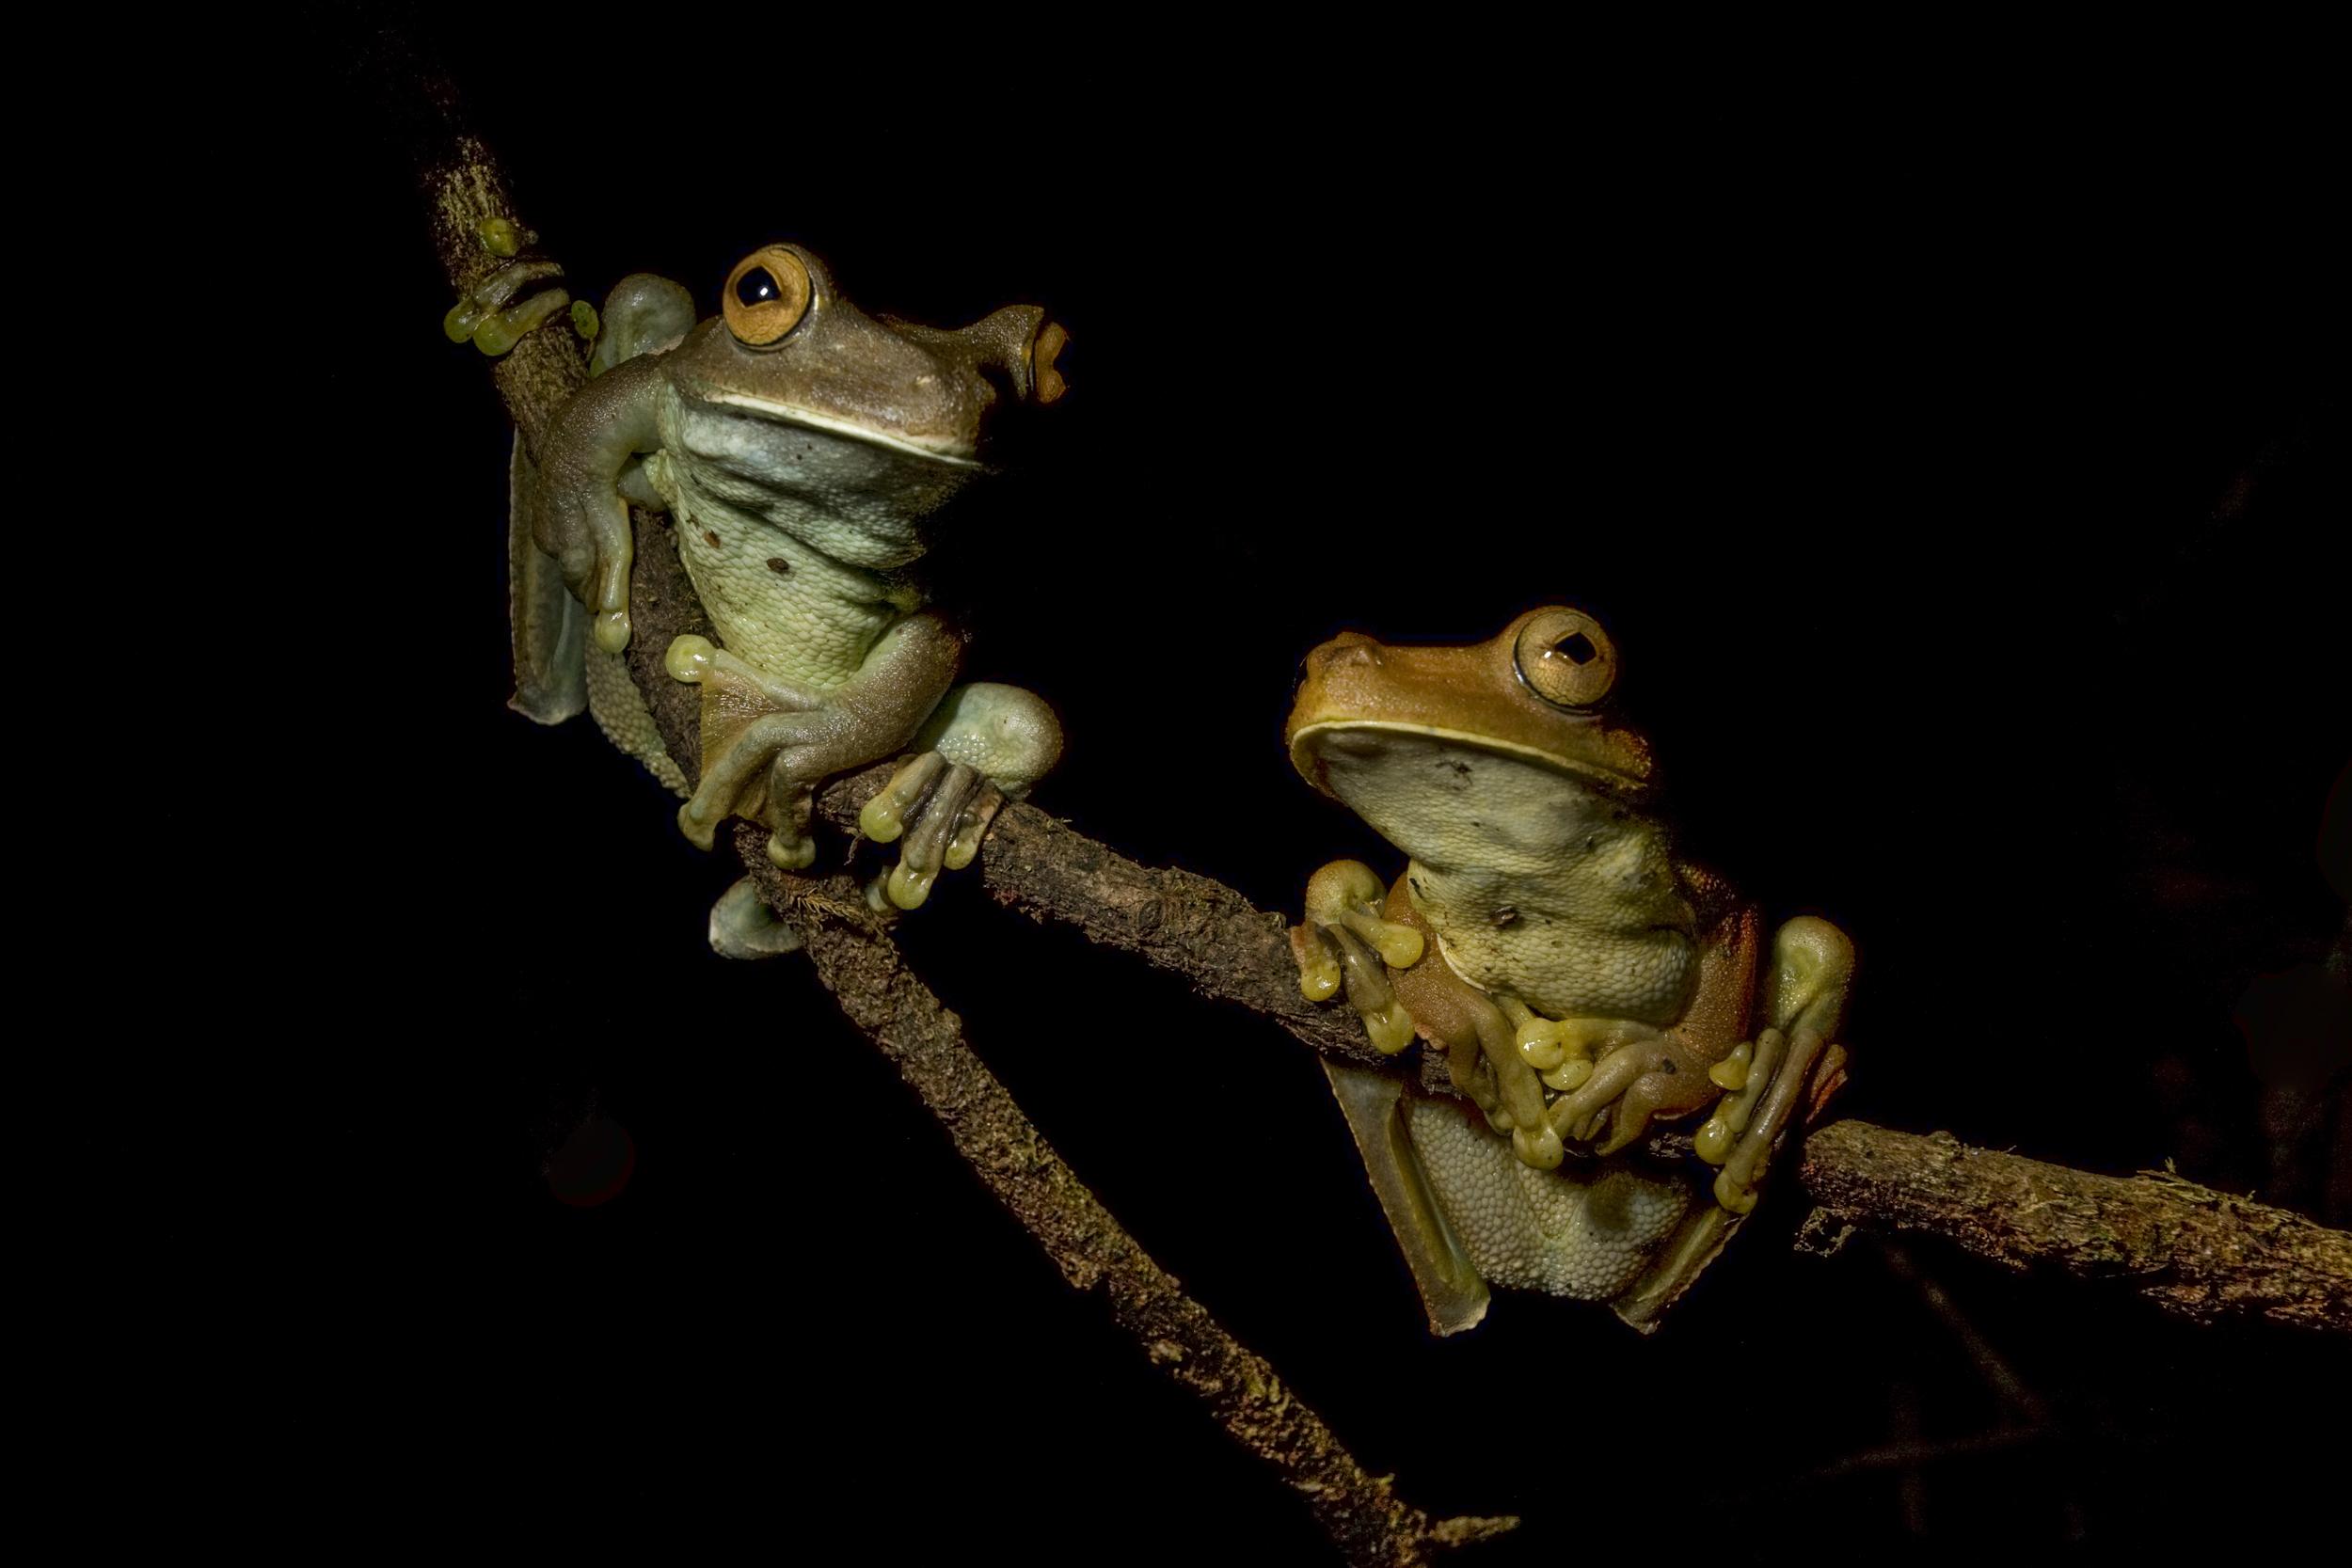 Gladiator tree frogs (Hypsiboas boans) Northern Range, Trinidad